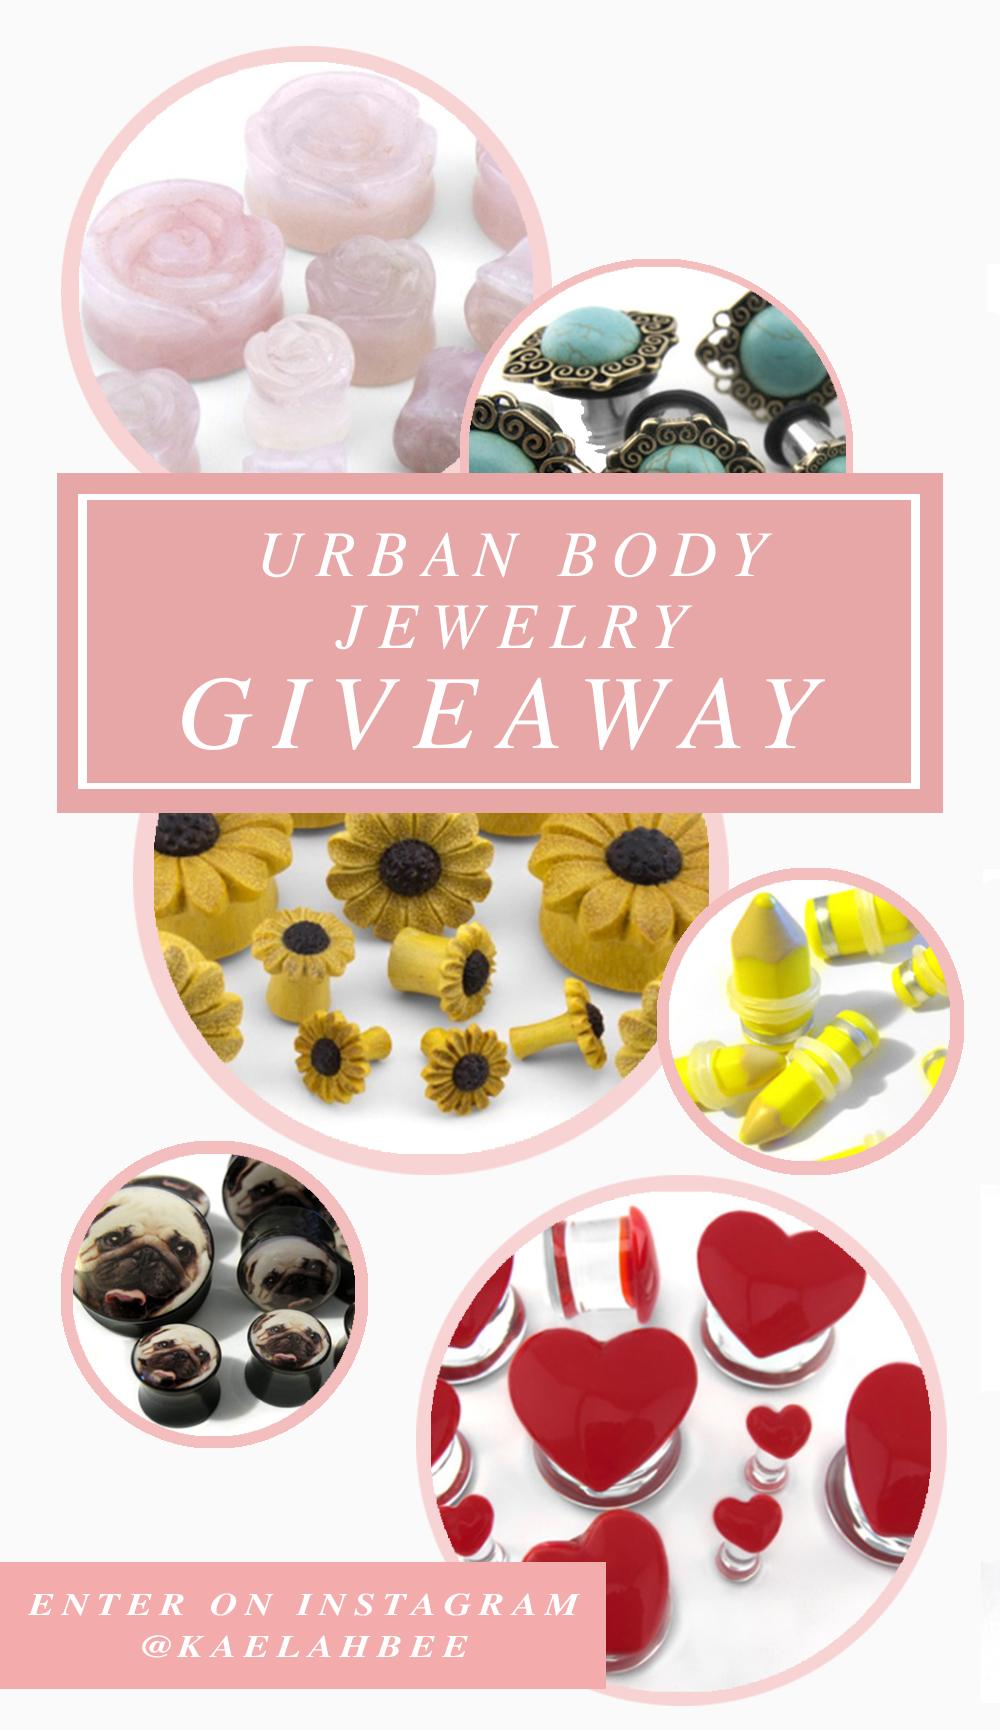 Urban Body Jewelry Giveaway